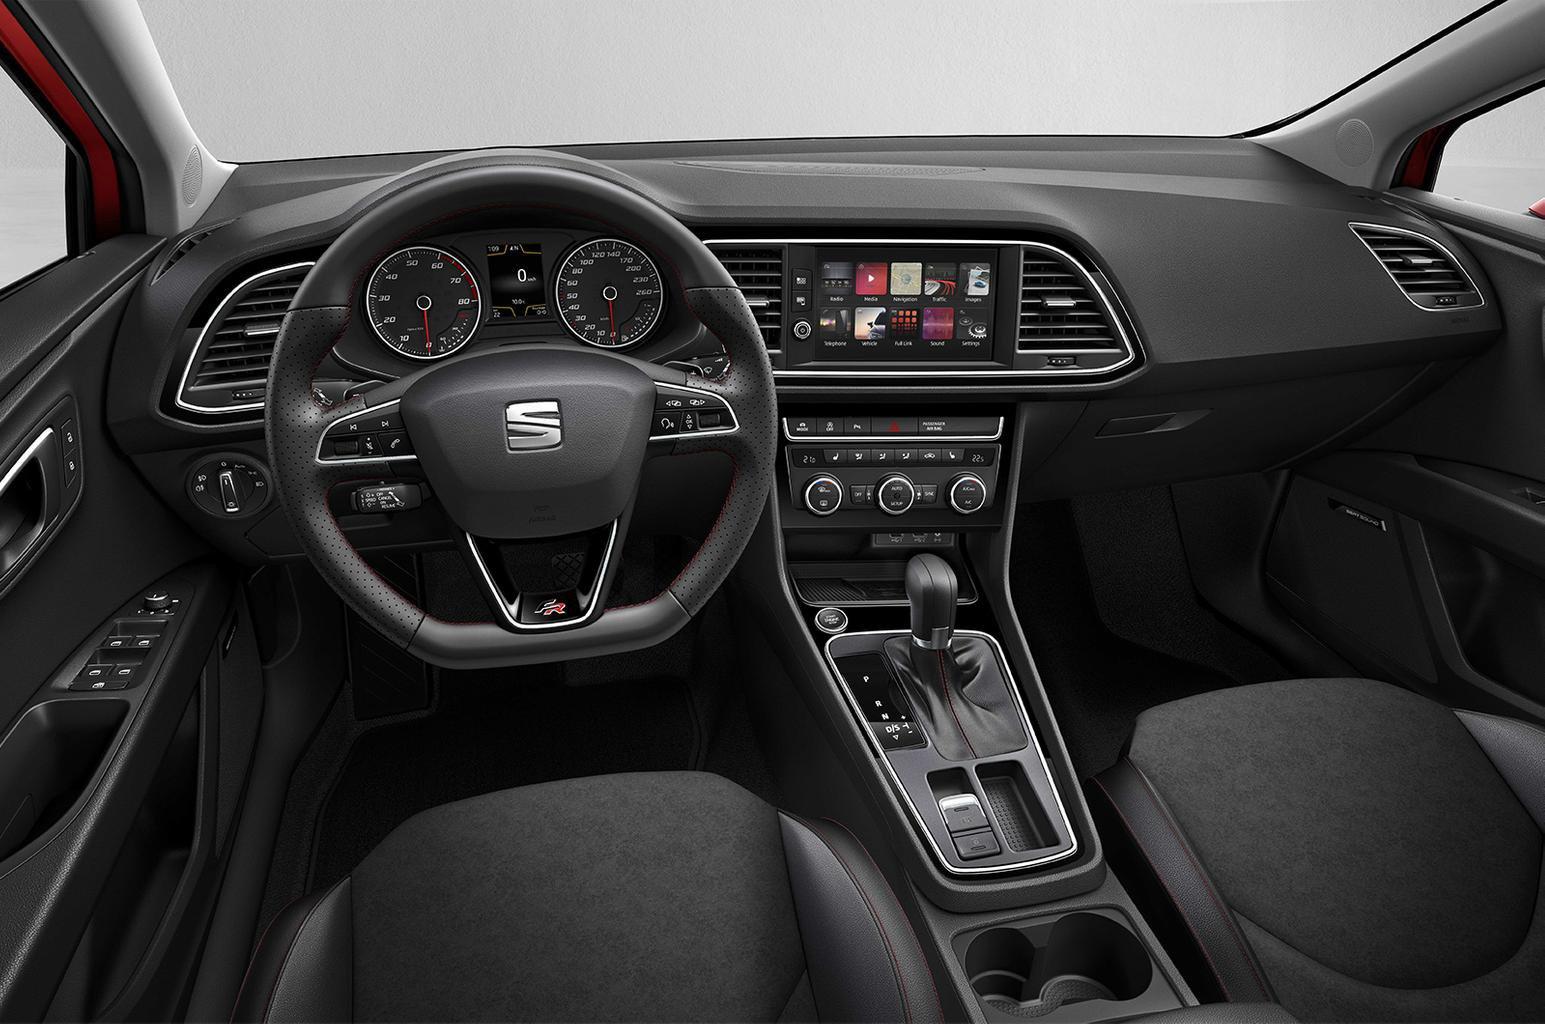 Seat Leon hatchback